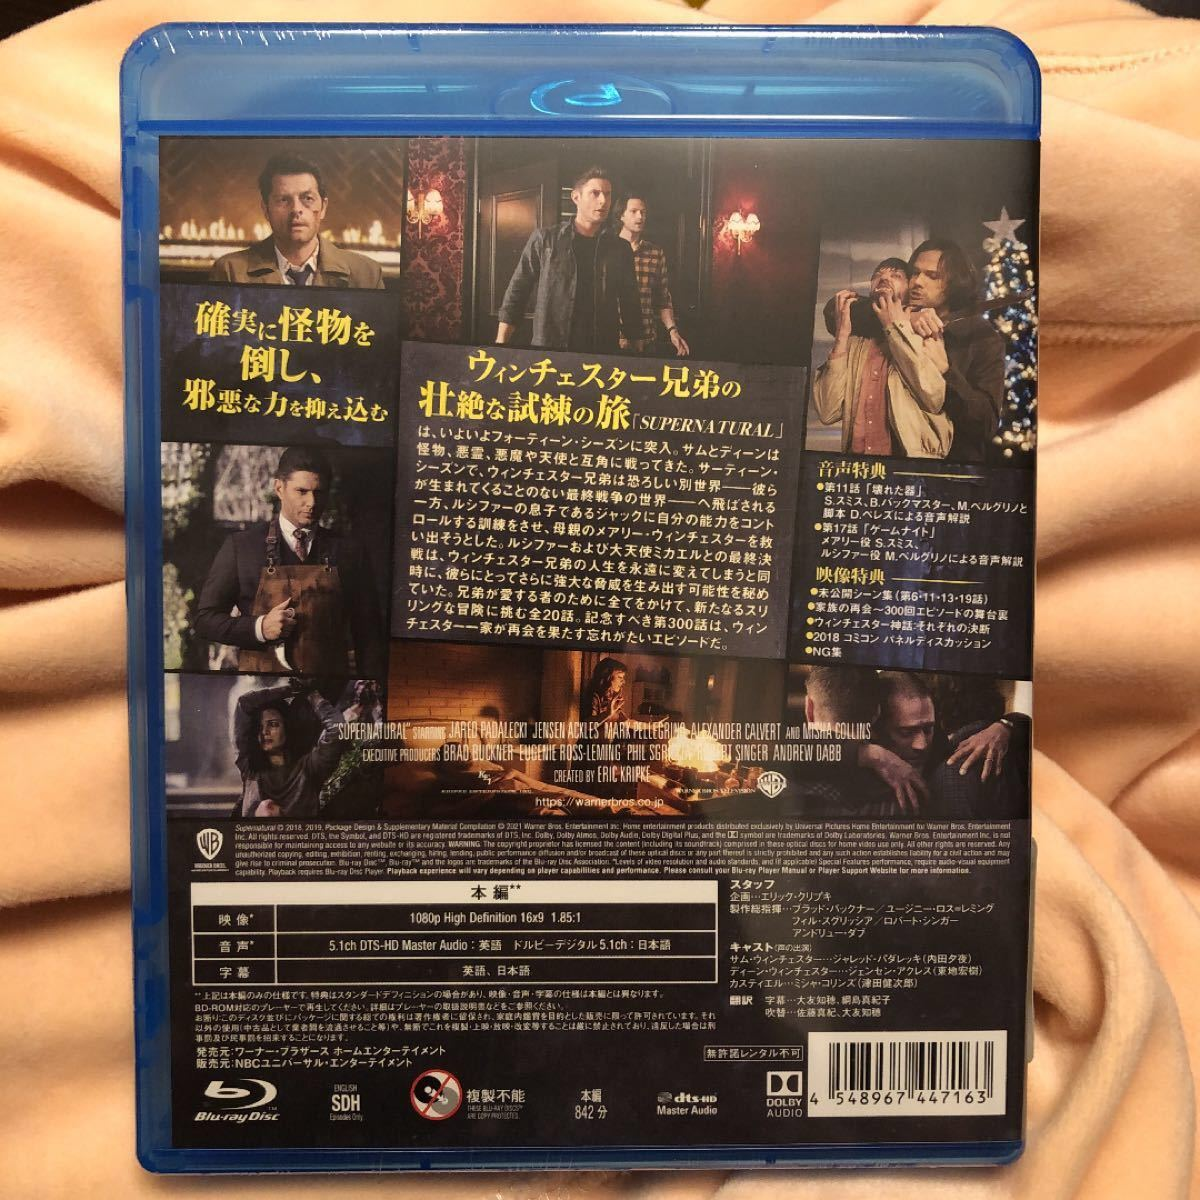 SUPERNATURAL (フォーティーン) コンプリートセット Blu-ray